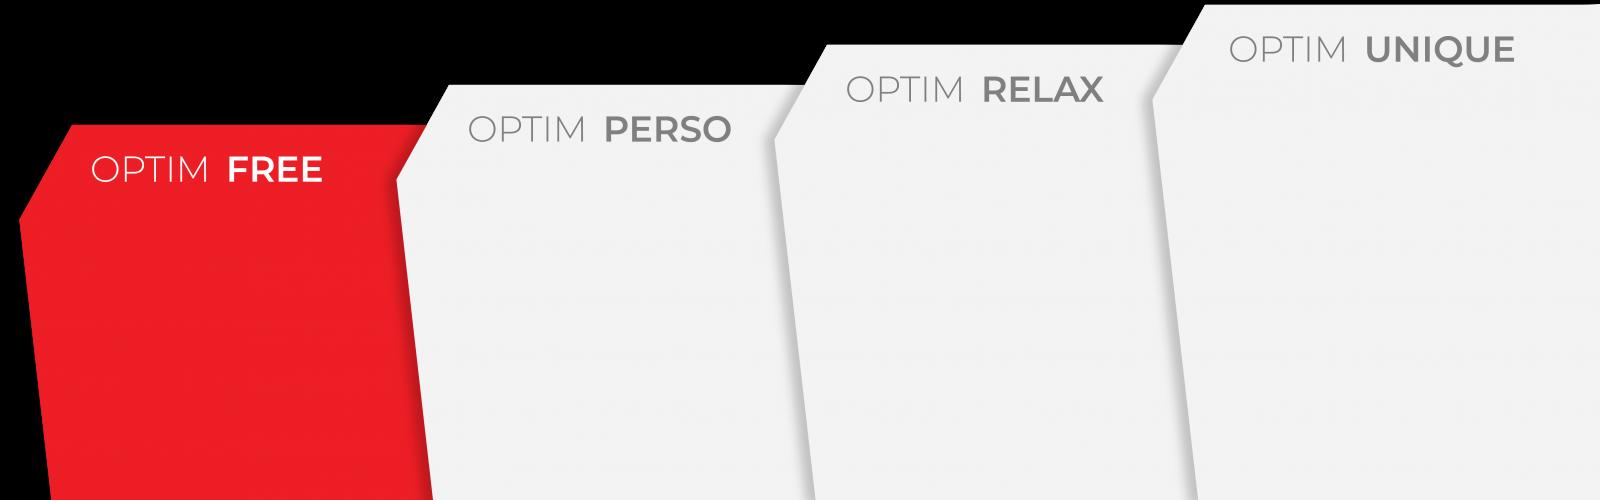 Optim_Free_Hero2